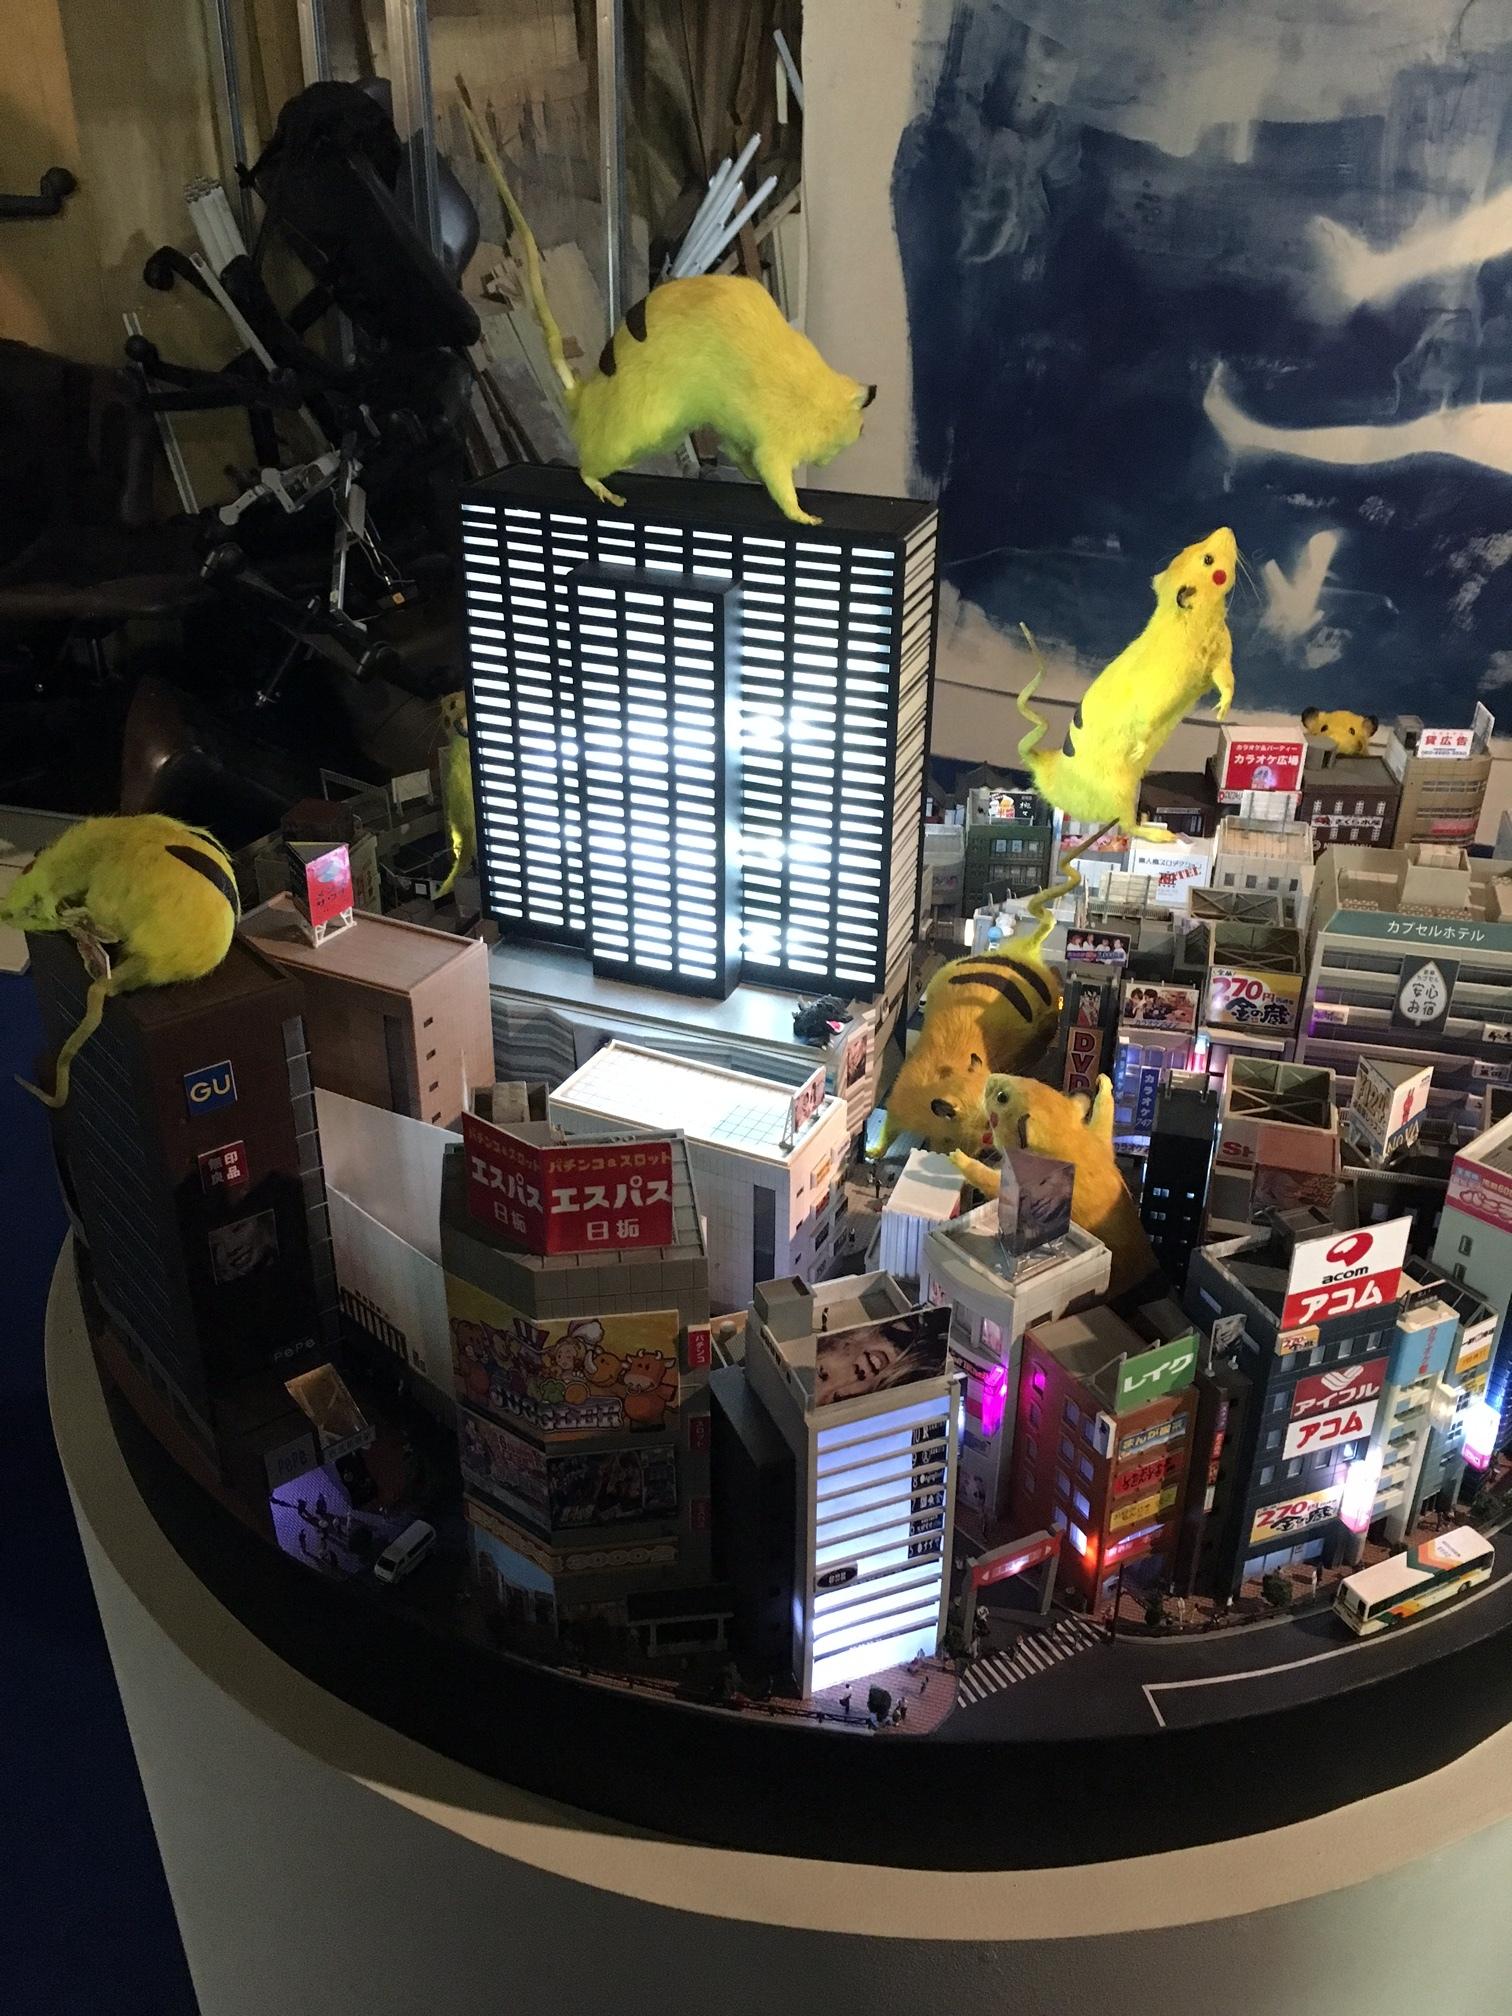 SUPER RAT -Diorama Shinjuku- 新宿の街のジオラマには歌舞伎町振興組合ビルもあった。